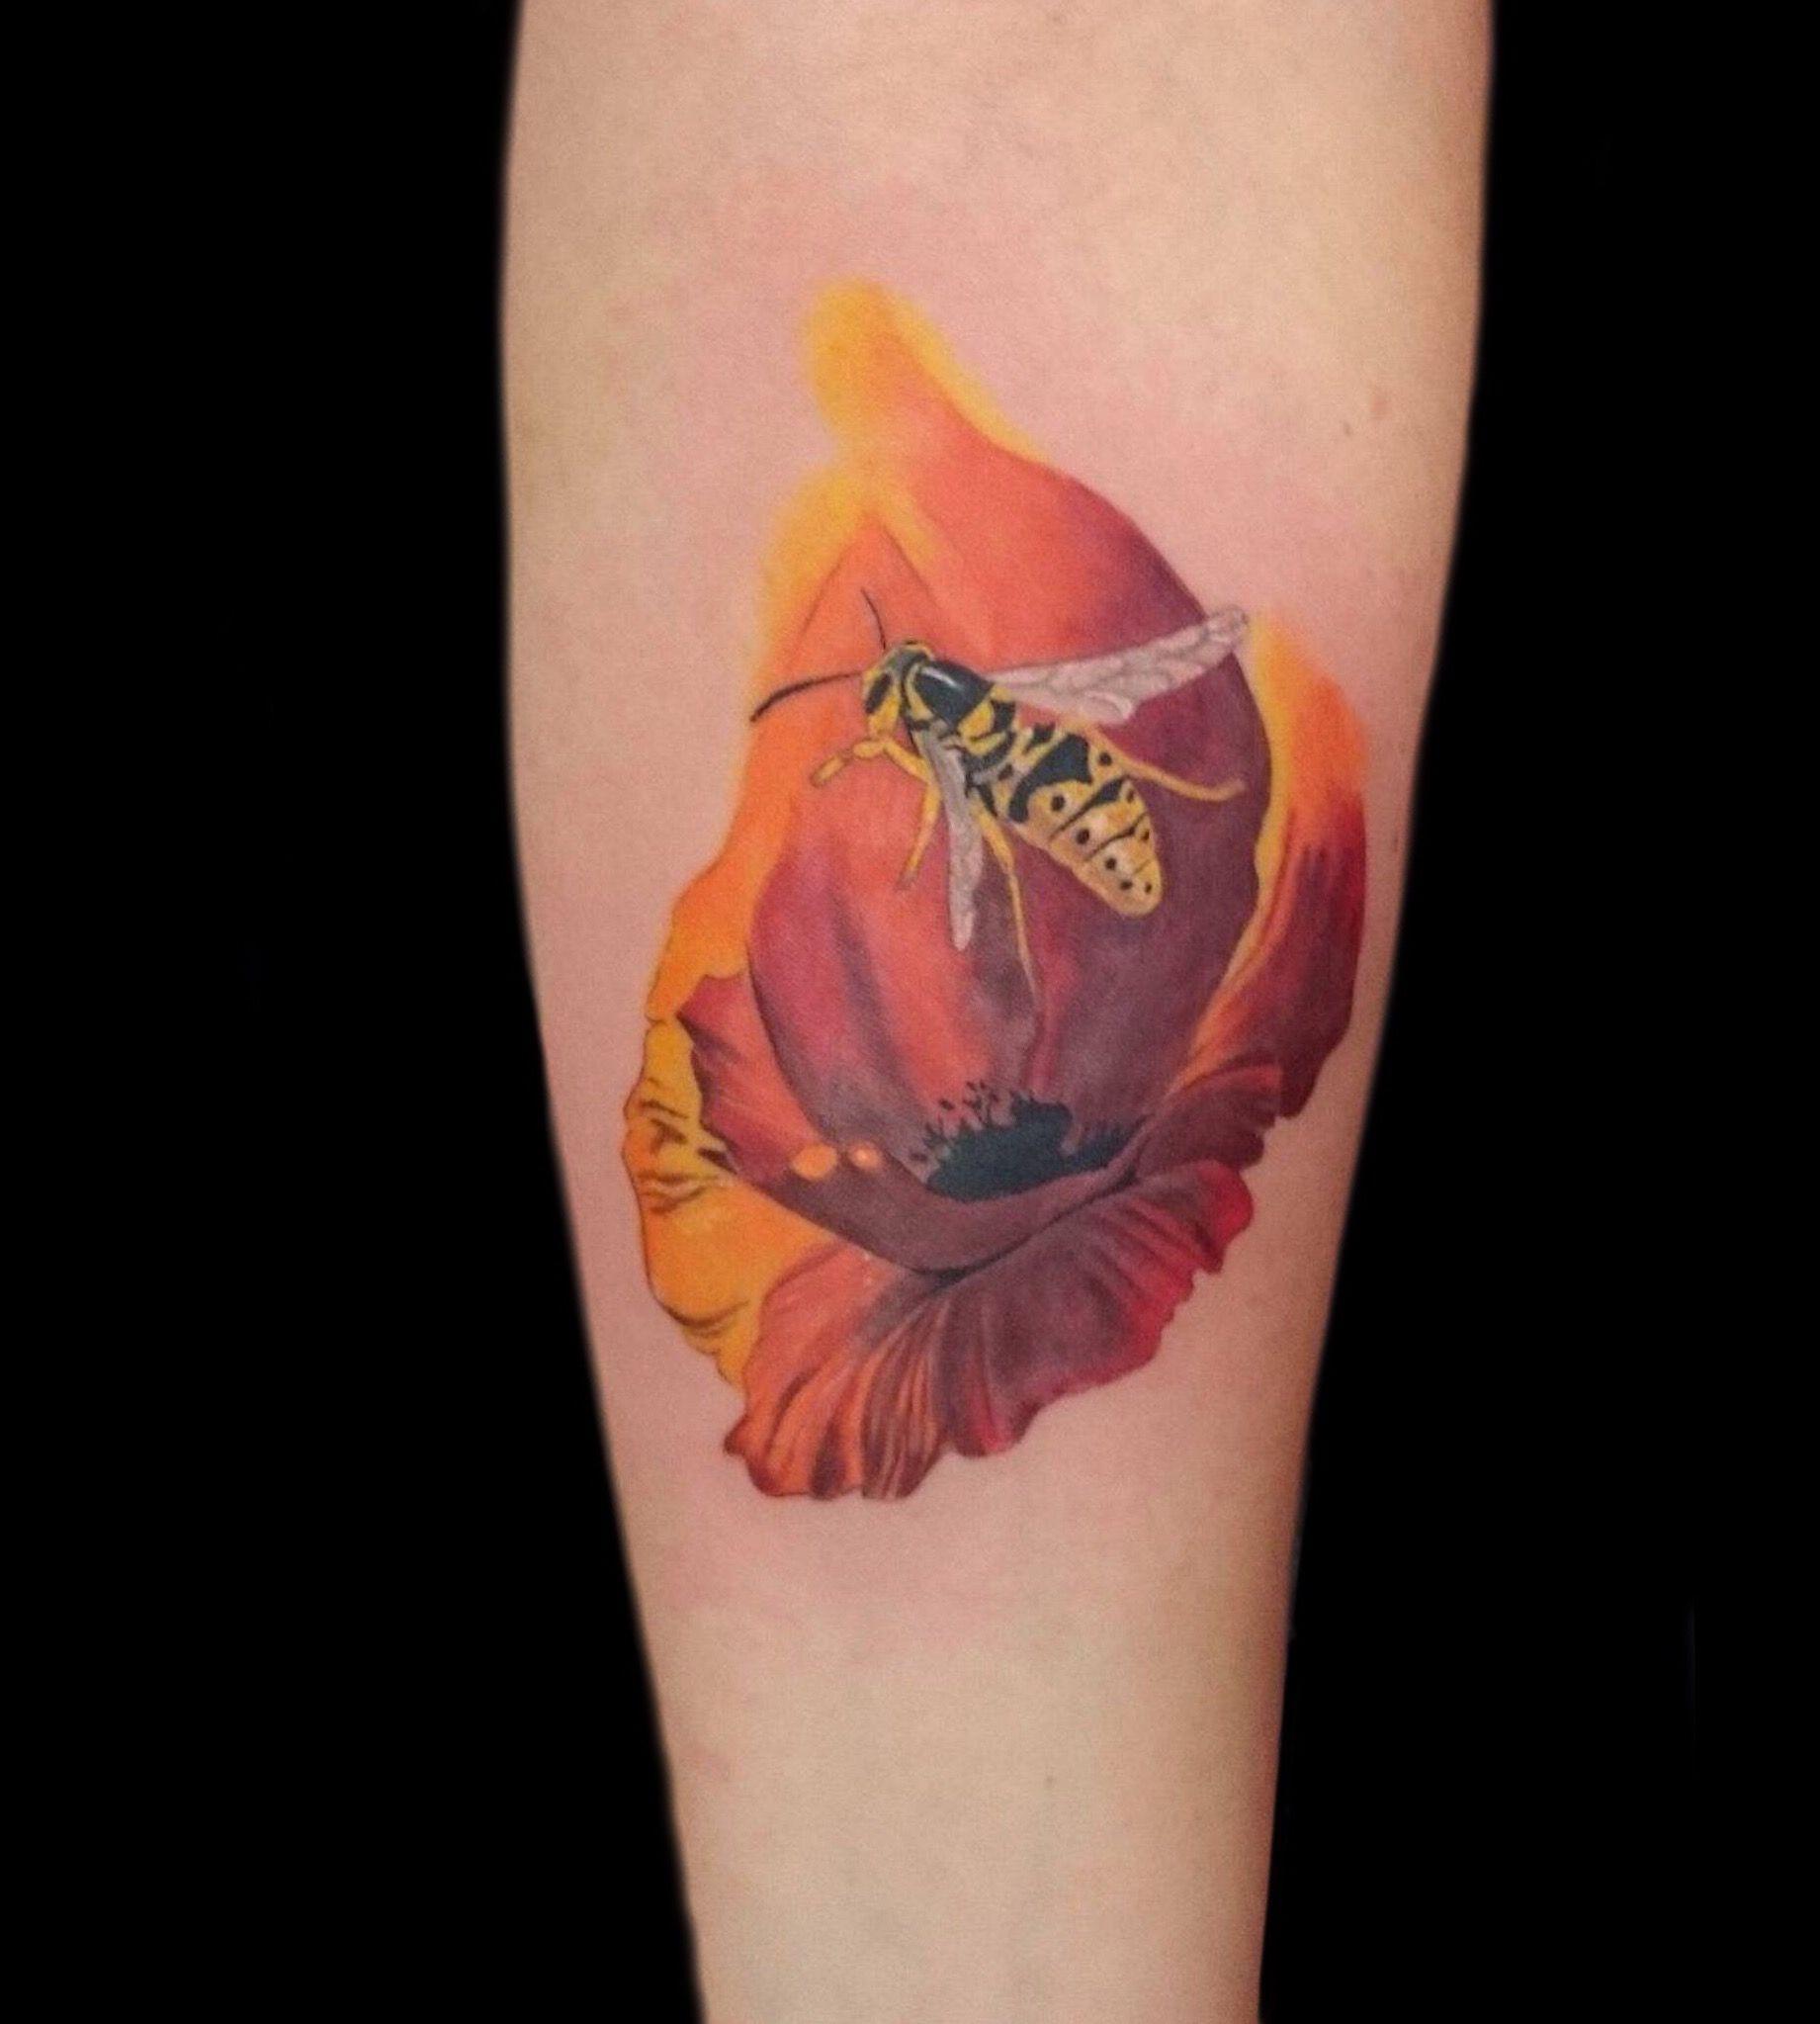 Poppy Bee Tattoo By Dan At Holy Trinity Tattoos Revelation Tattoo Tattoos Tattoo Studio